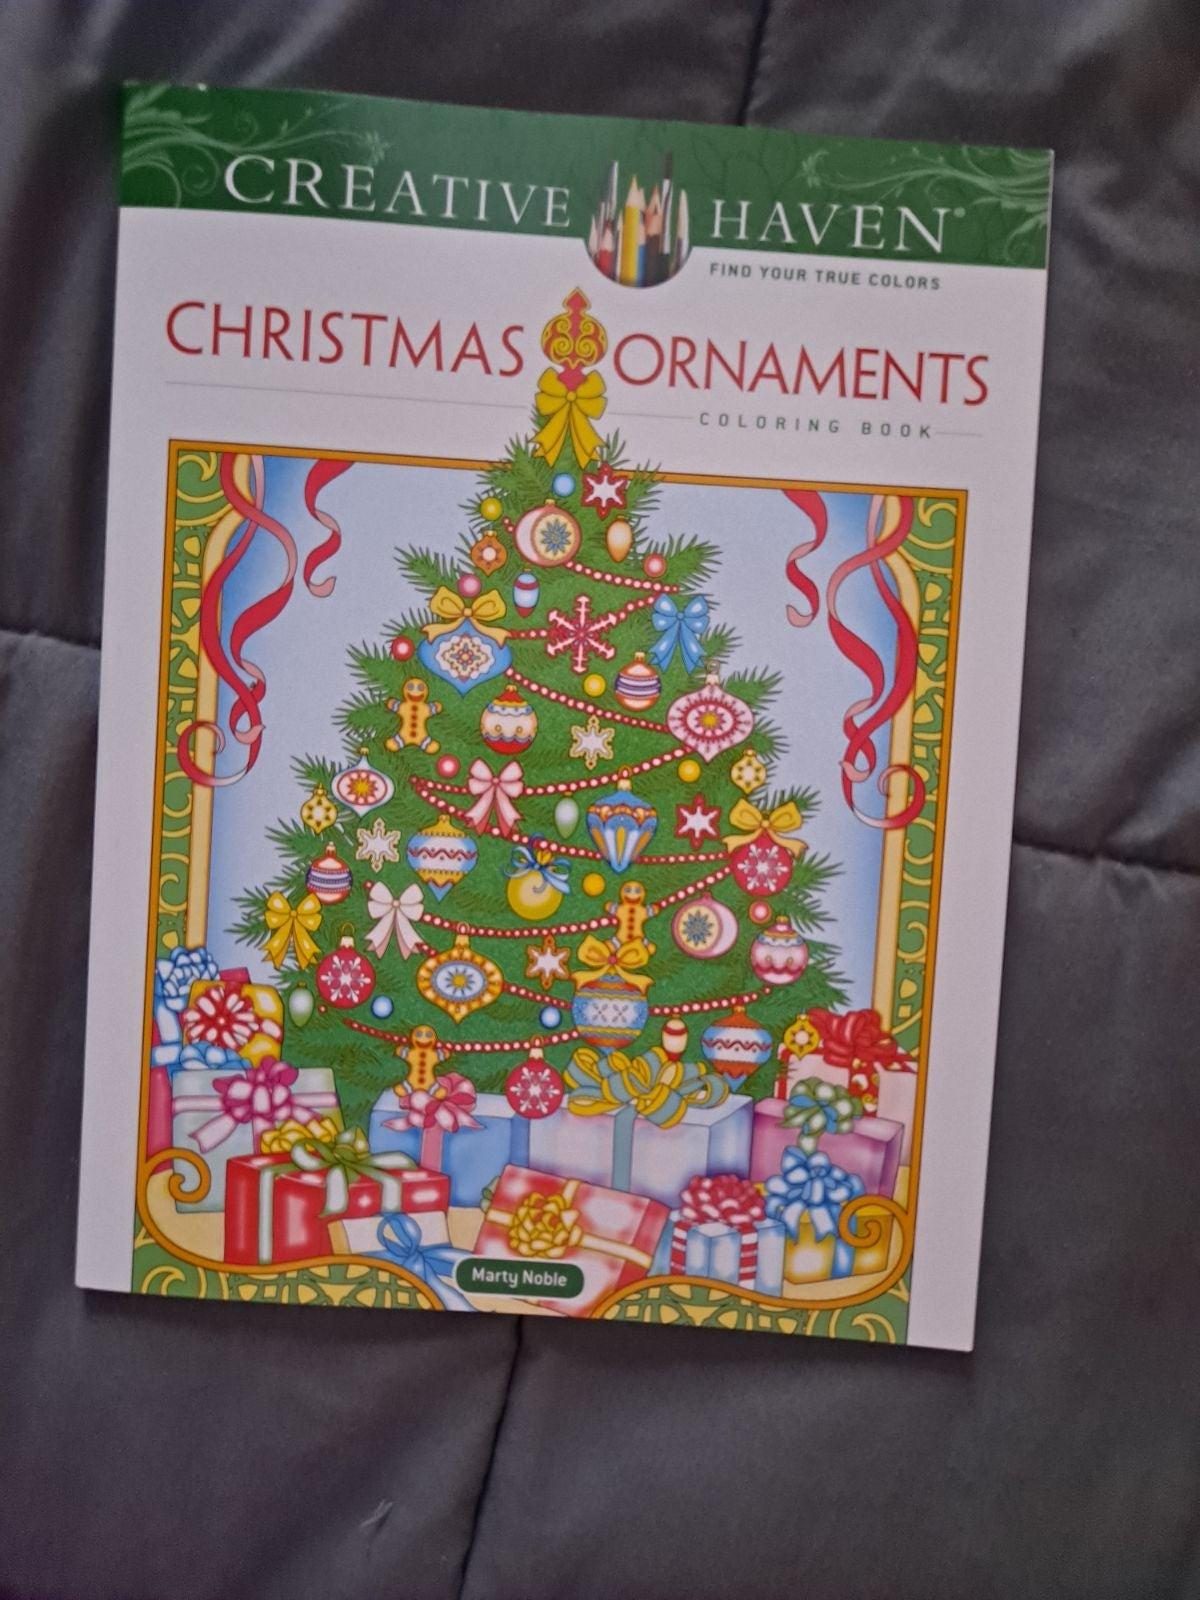 Creative ornaments coloring book